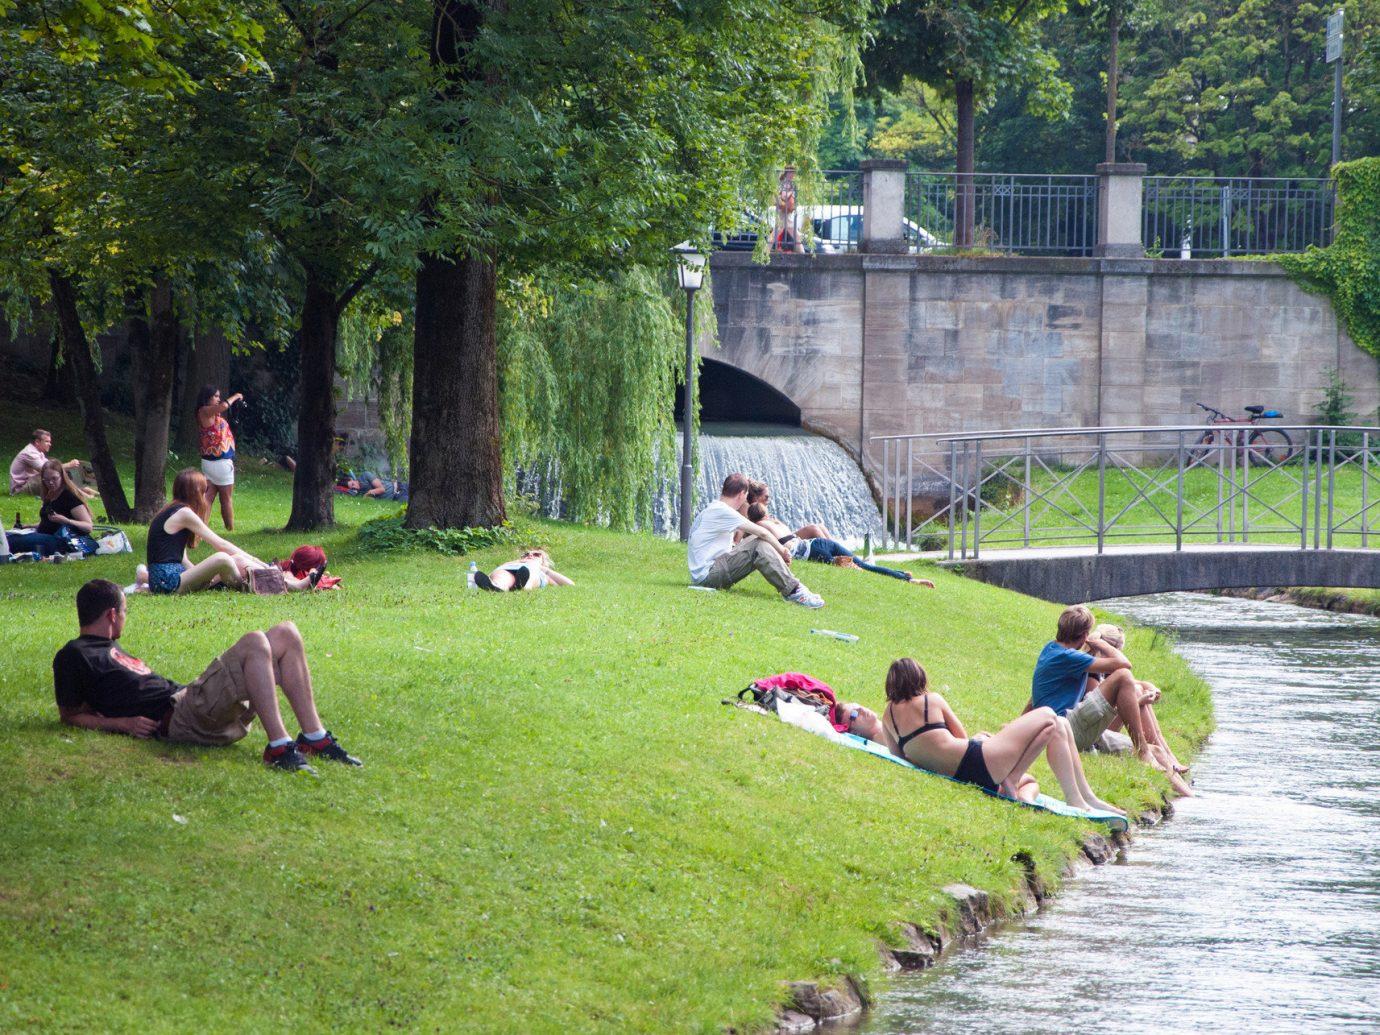 Berlin Germany Munich Trip Ideas tree grass outdoor leisure park group people waterway